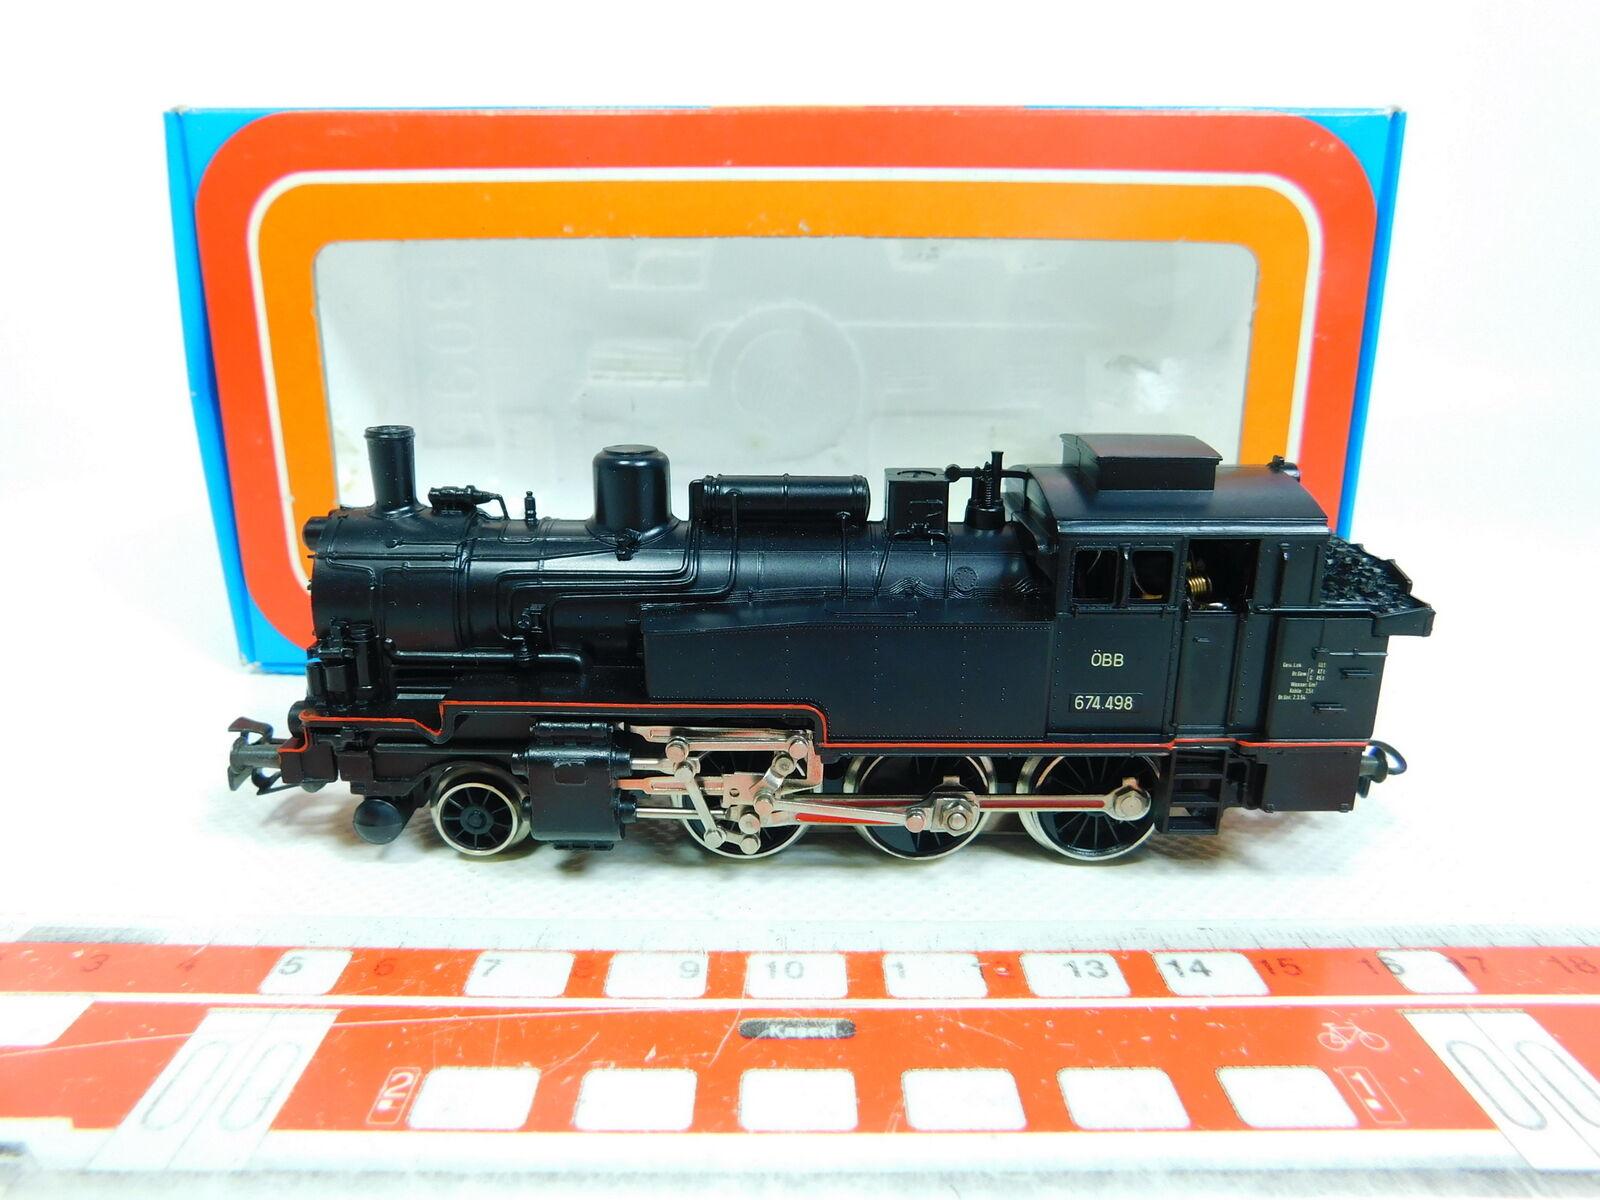 BV536-0,5 Märklin H0 Ac 3105 Tender Steam Locomotive 674.498 ÖBB,Very Good